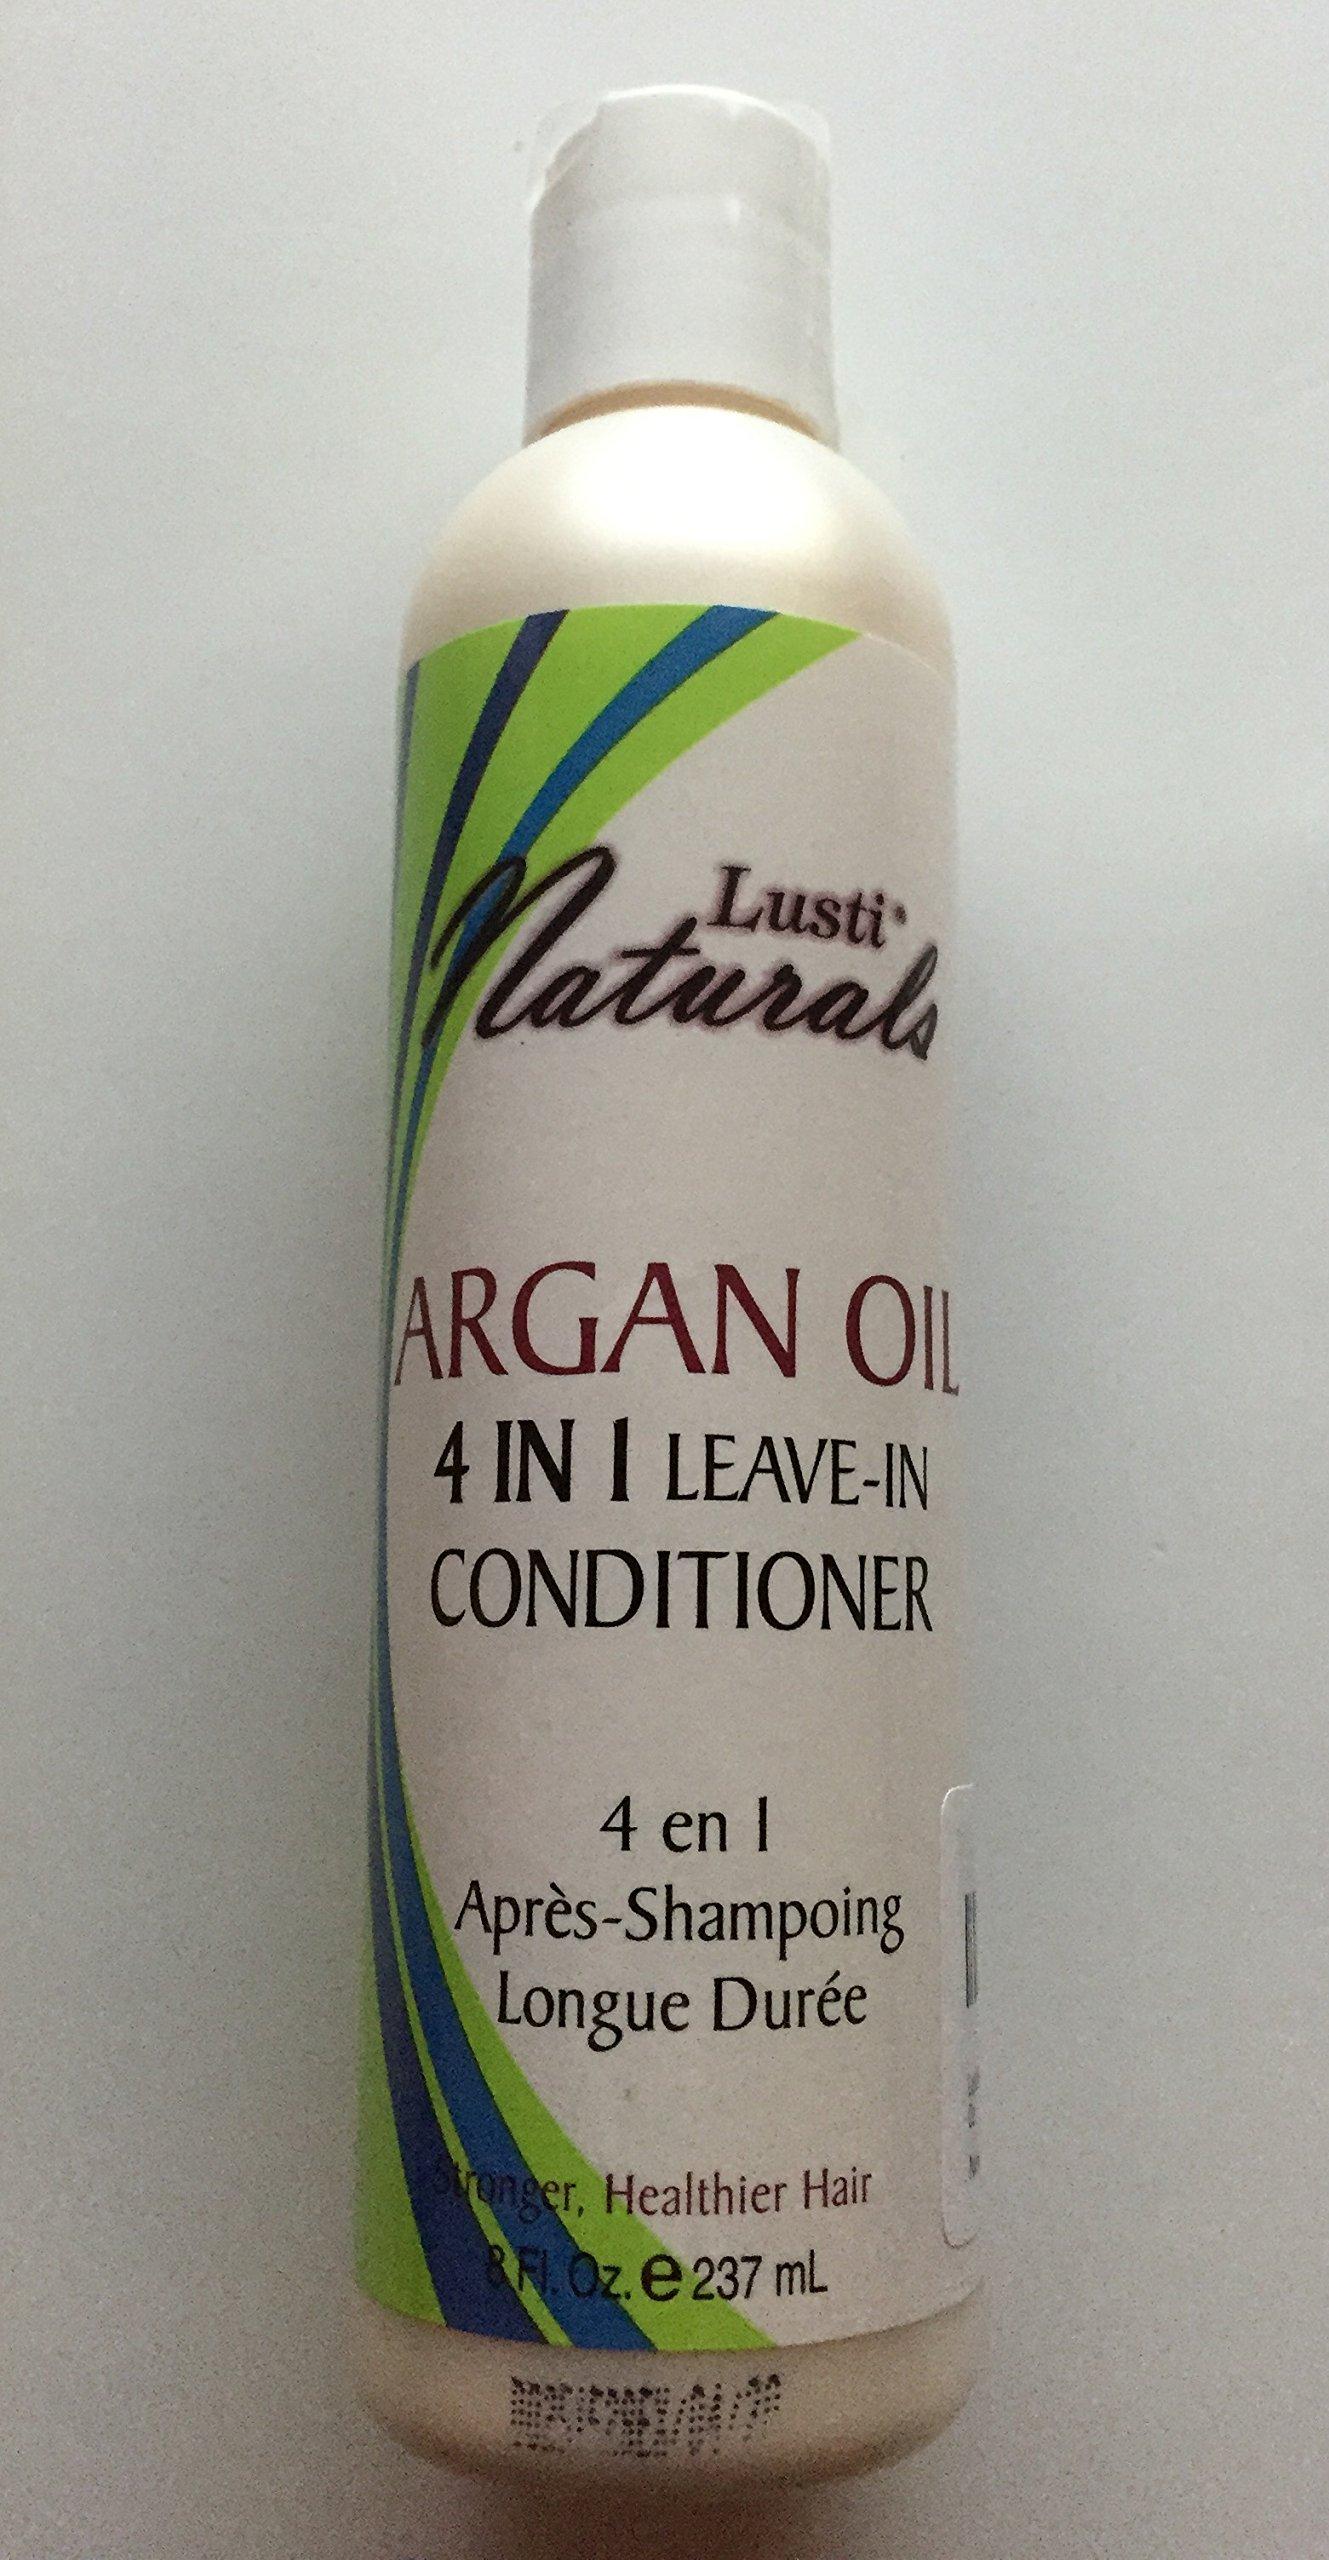 Lusti Naturals Argan Oil Hair Moisturizer